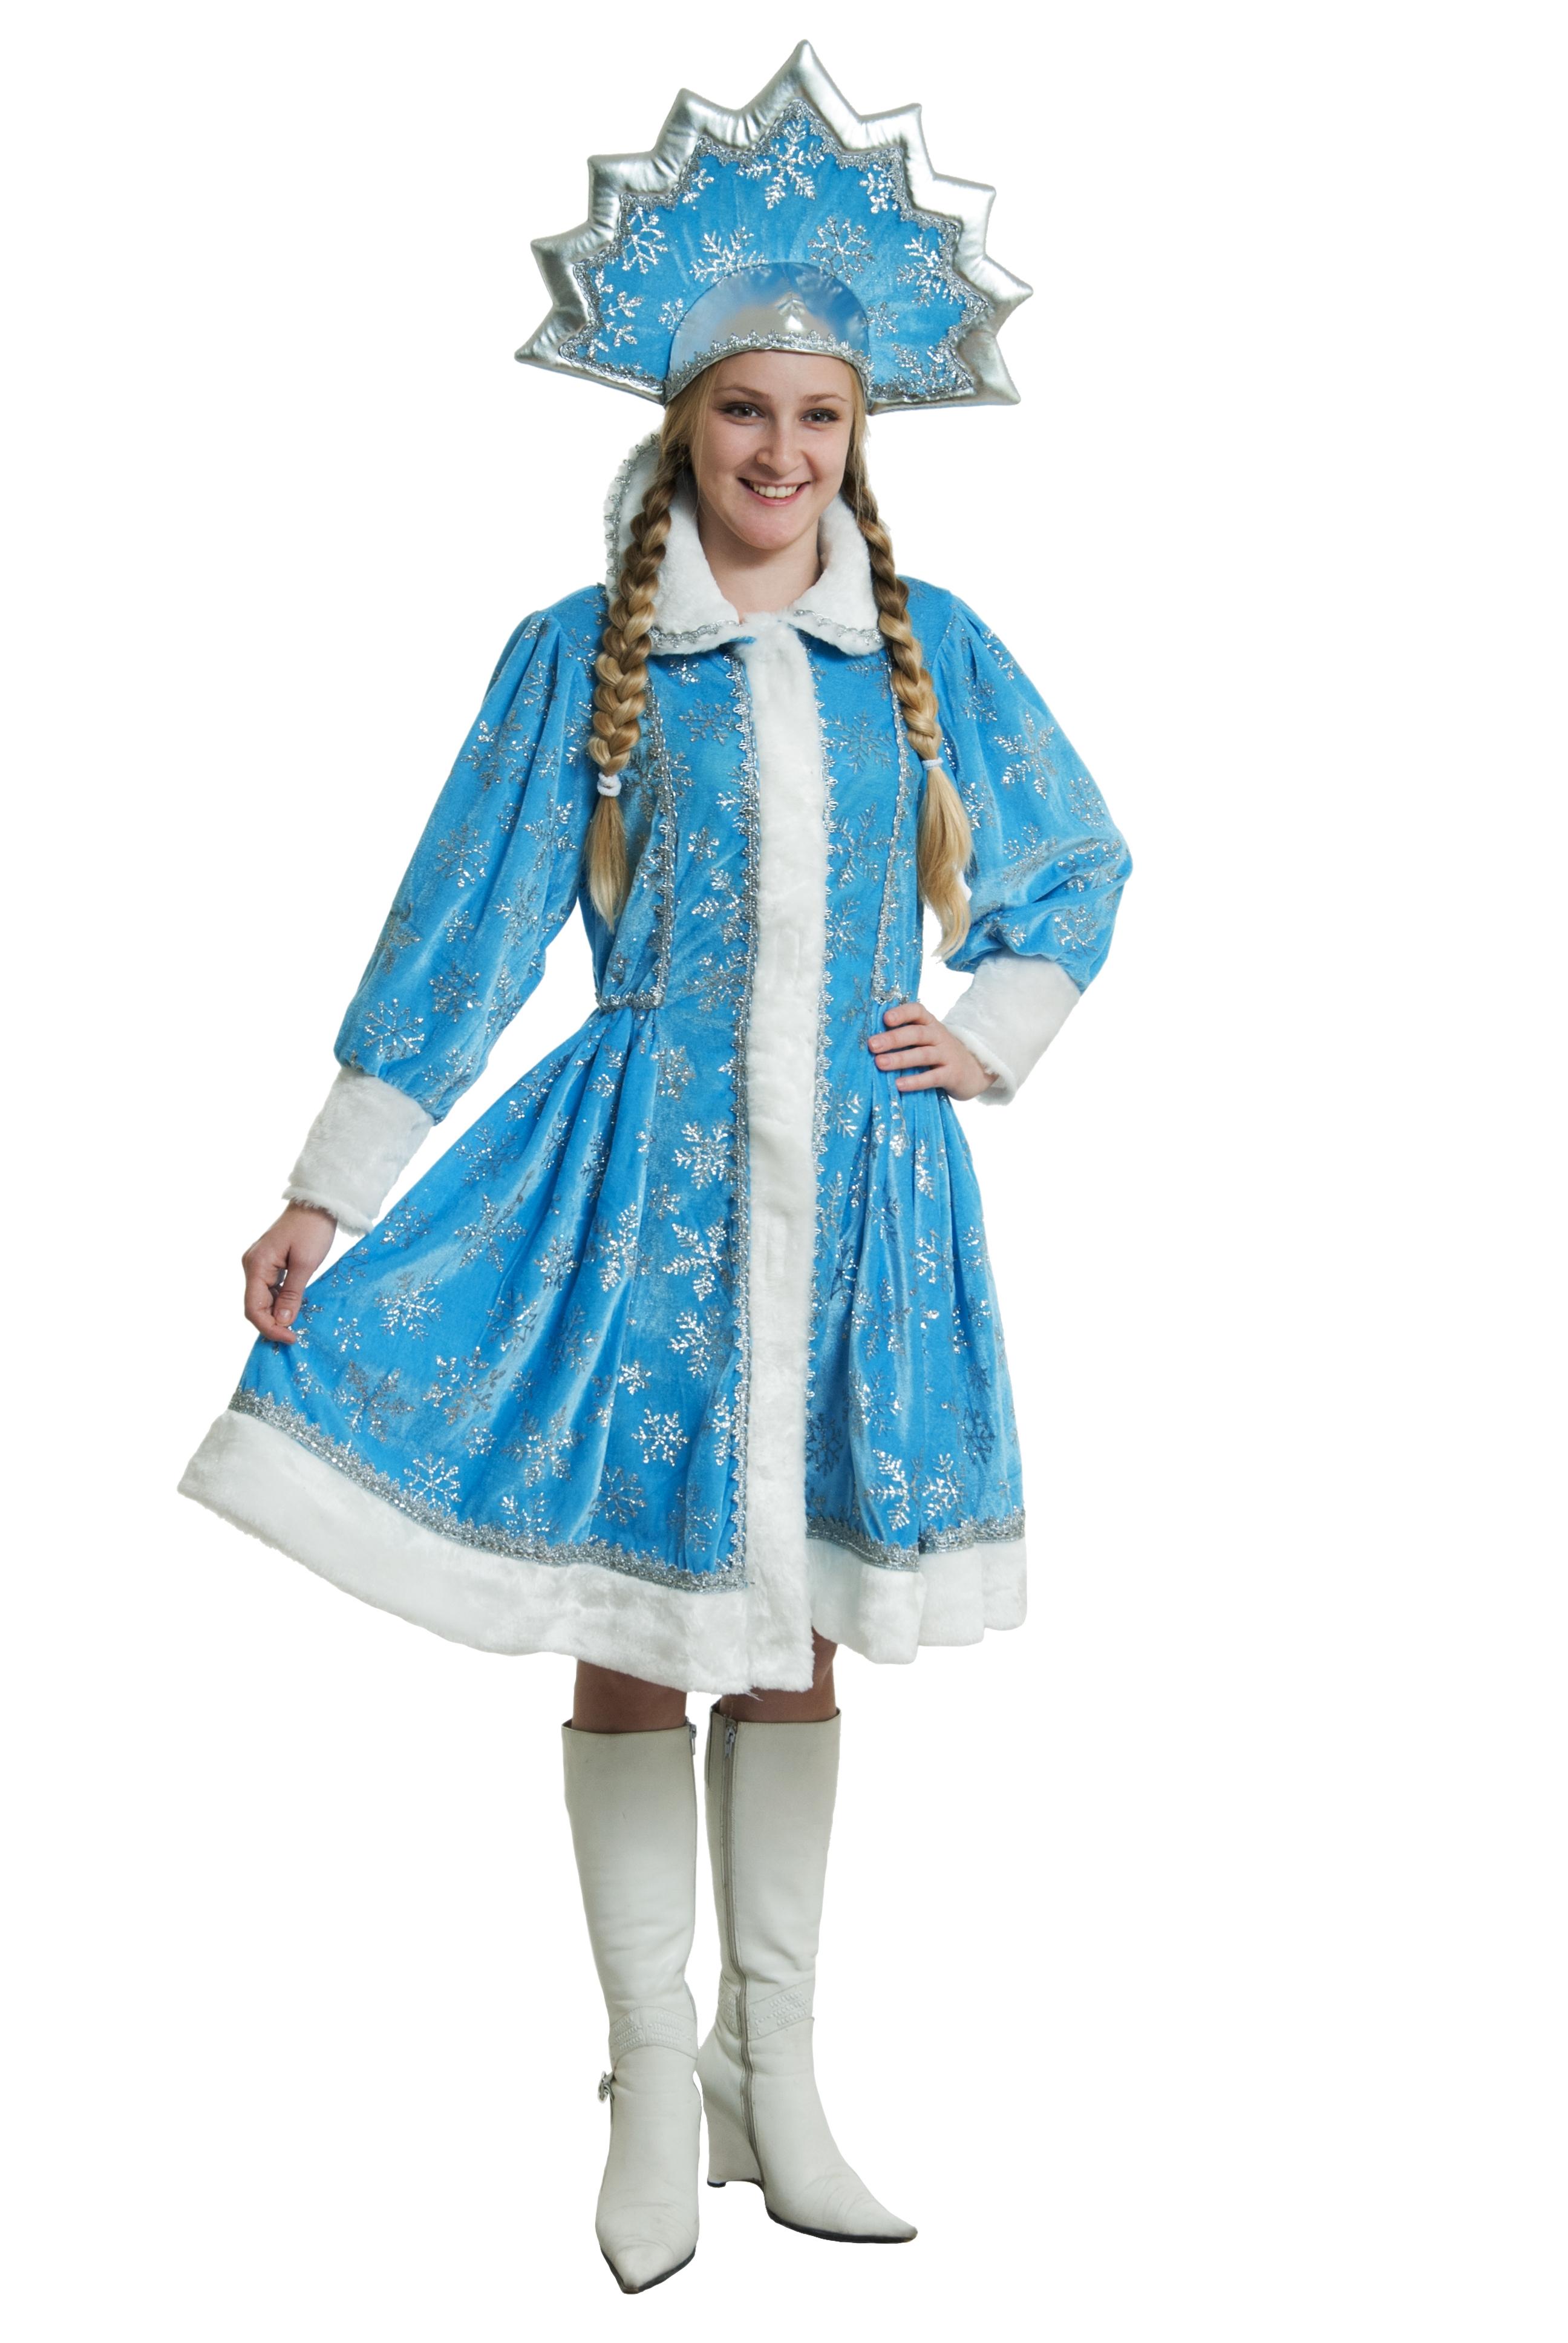 Костюм Снегурочки с Кокошником (44-46) костюм снегурочки конфетки 40 44